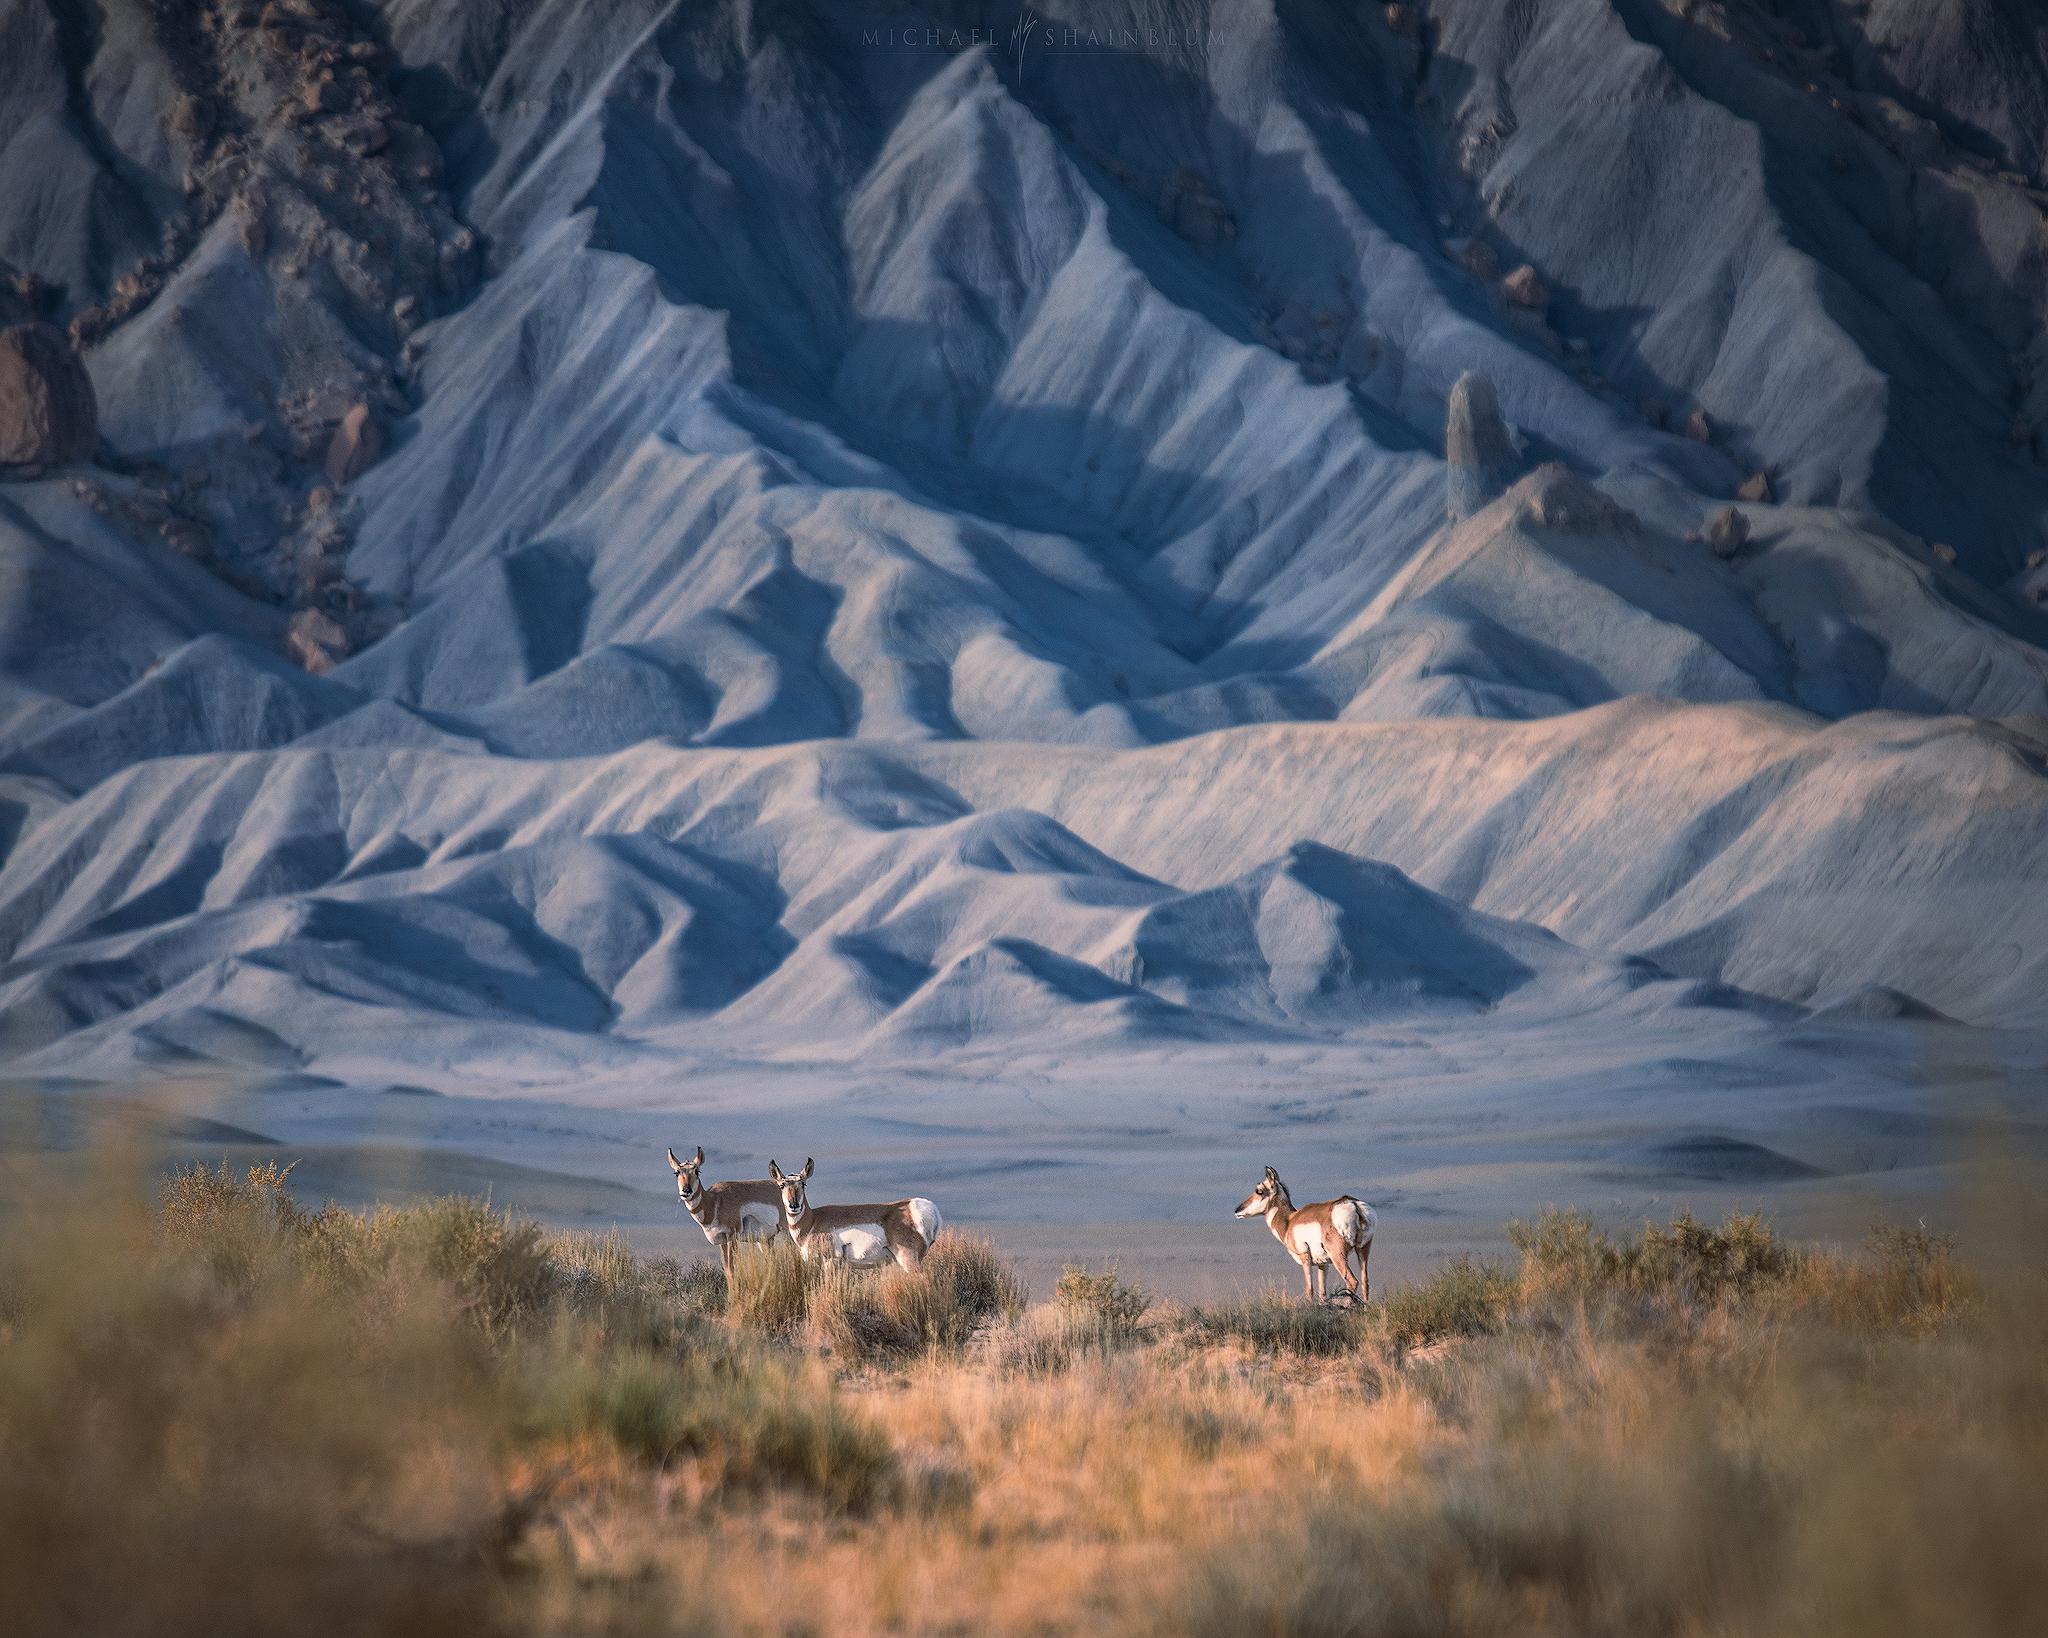 utah landscape photography 2020